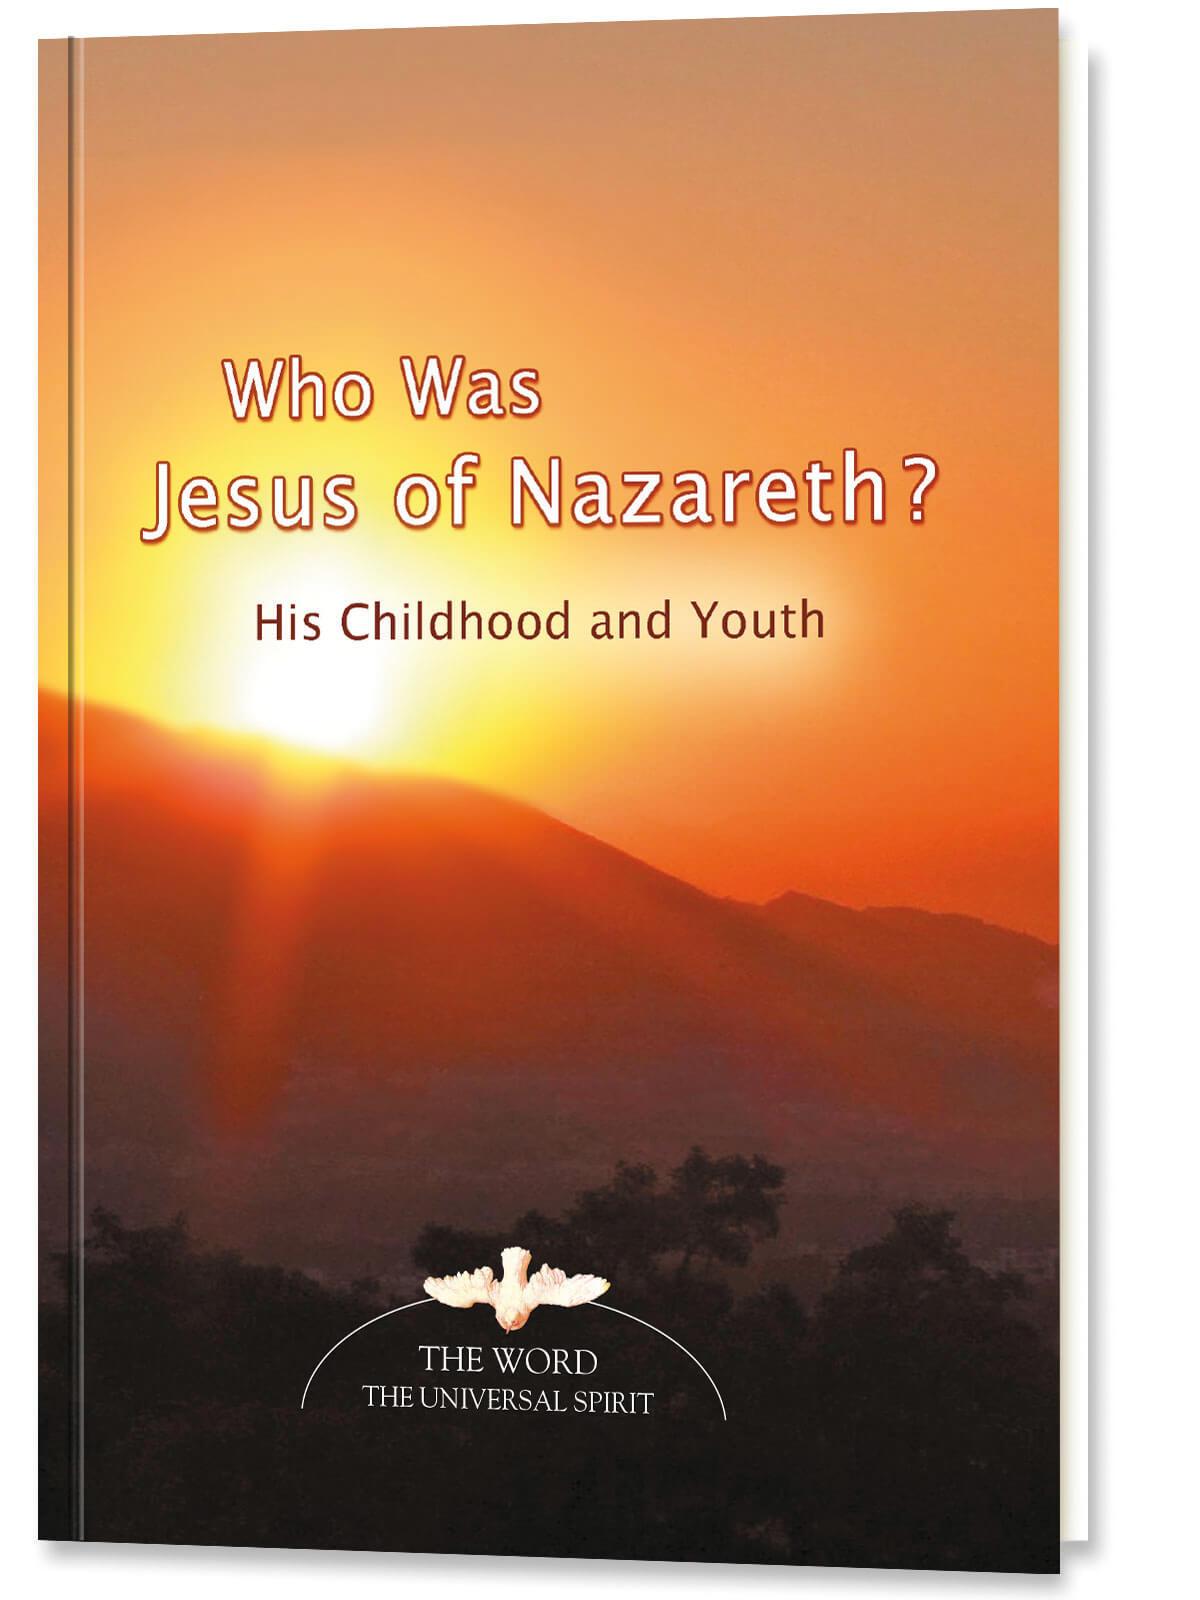 Who Was Jesus of Nazareth?